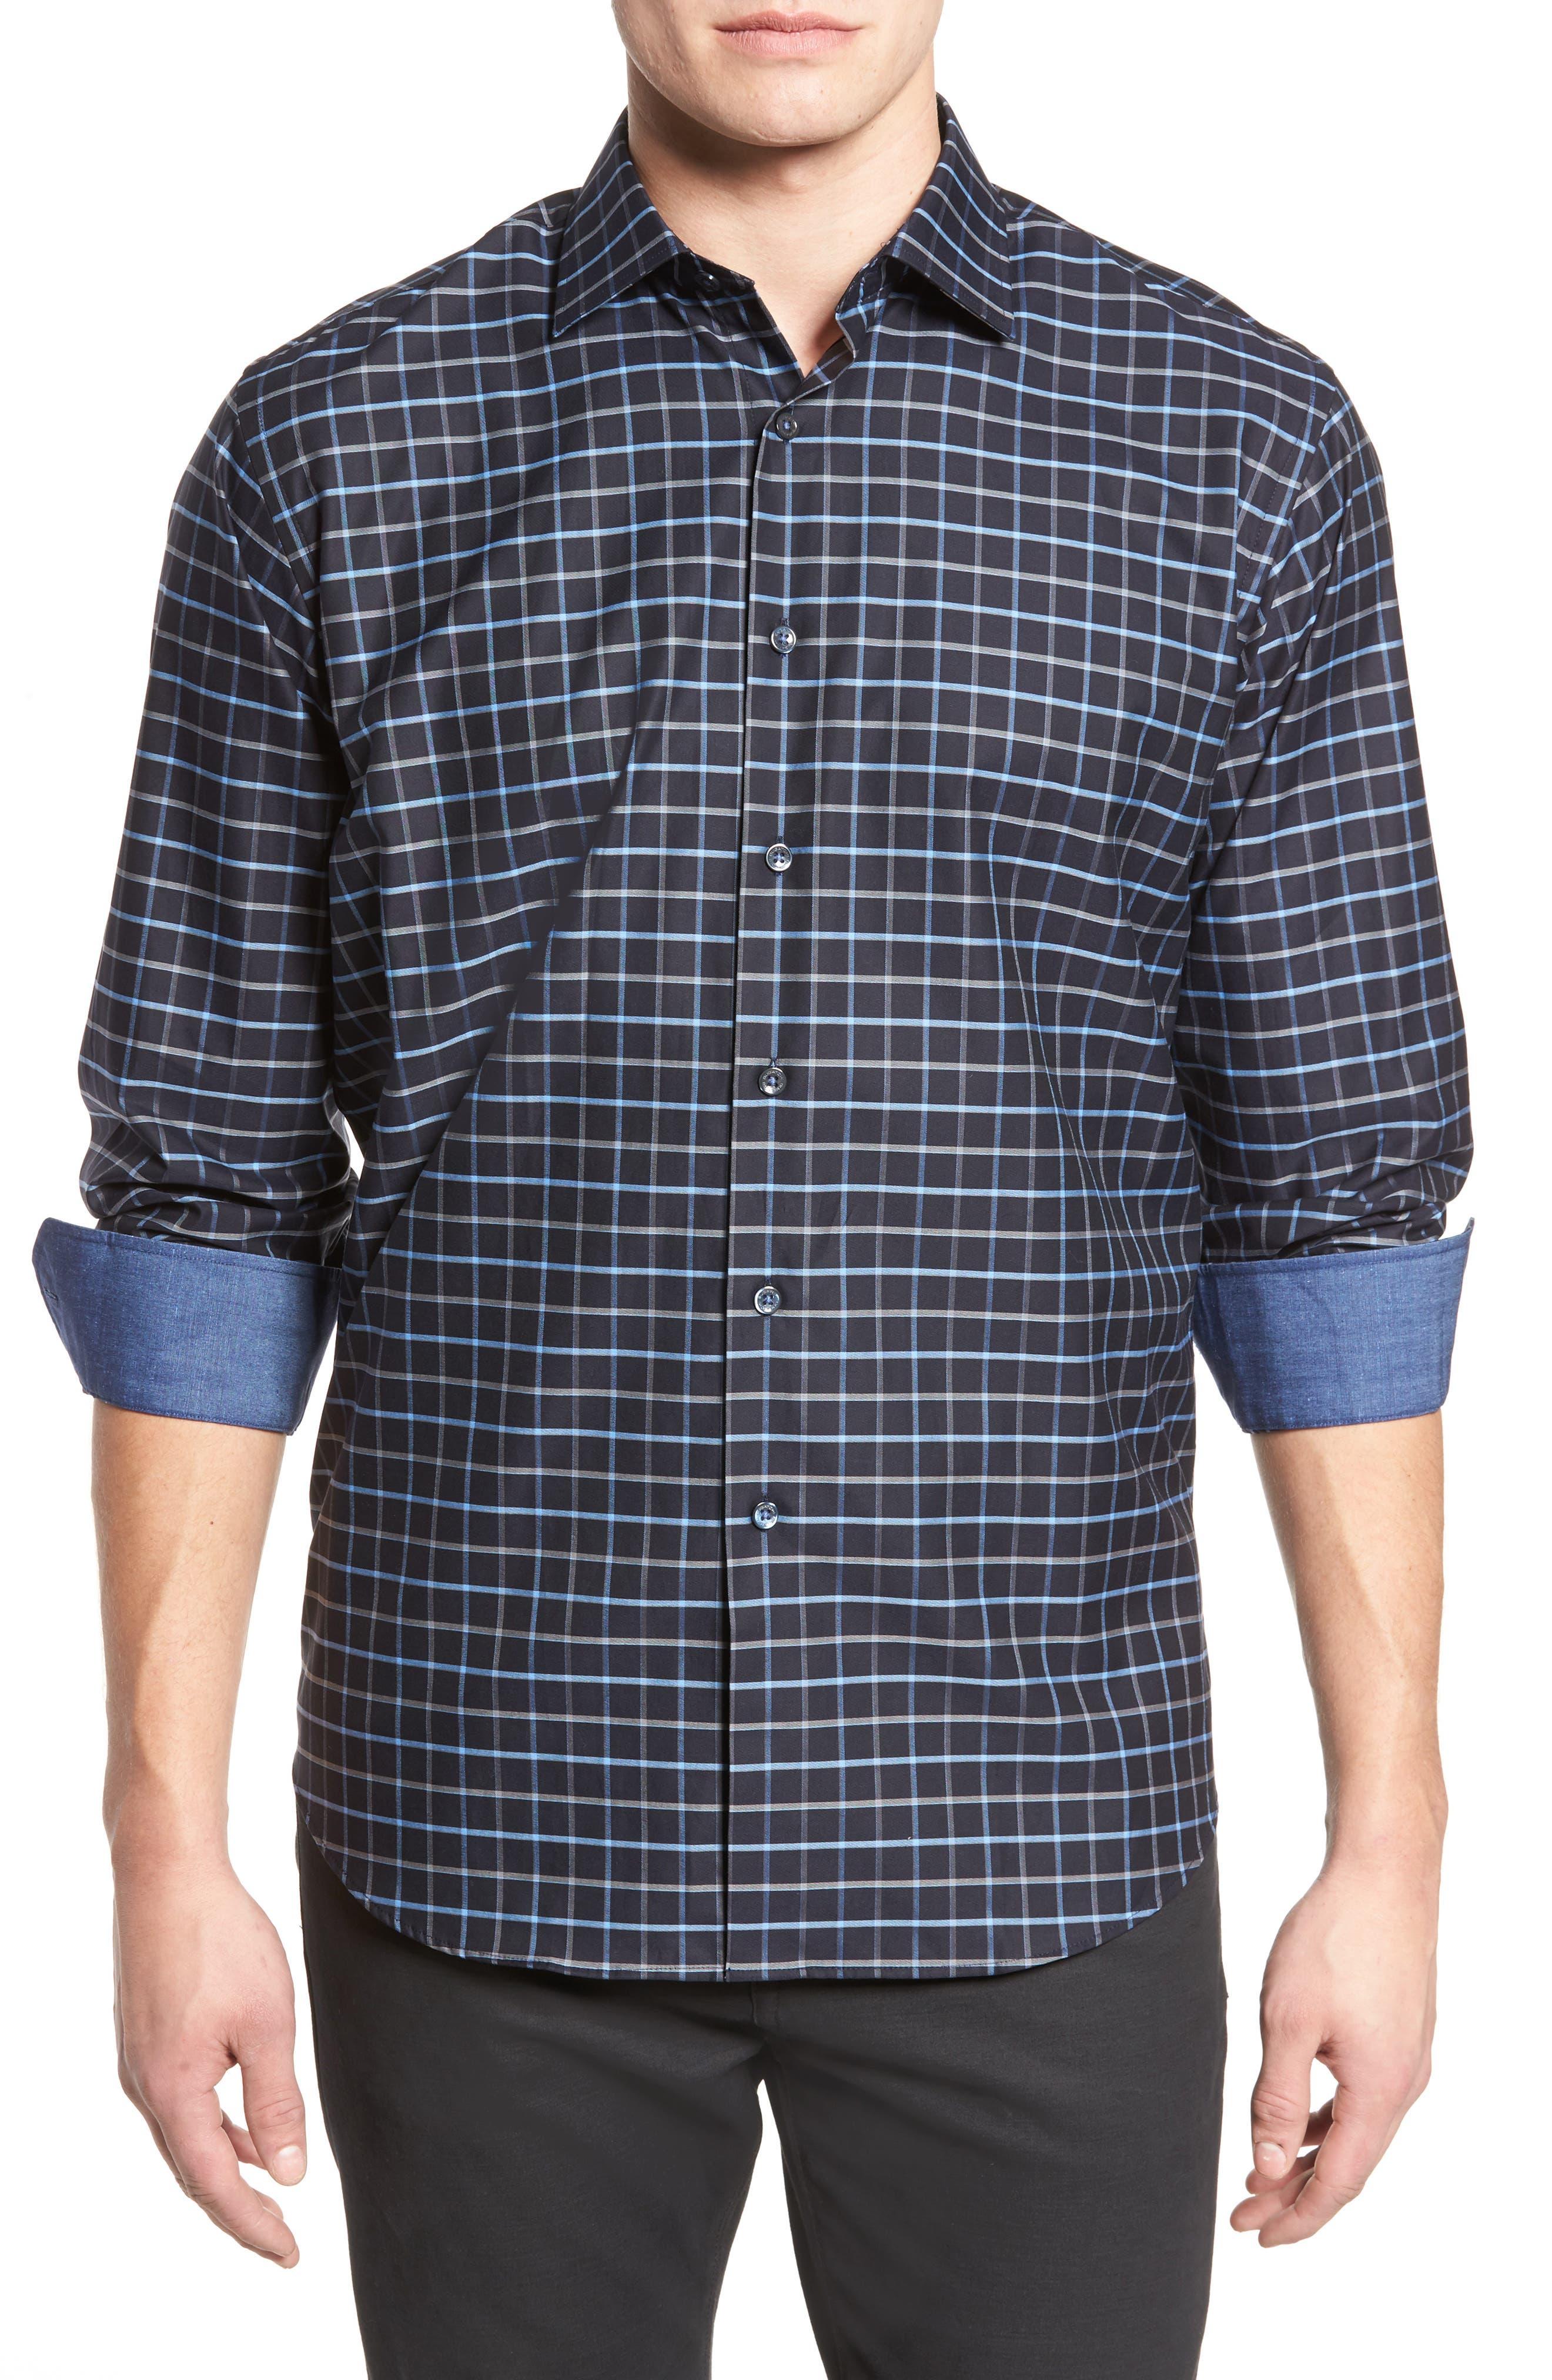 Alternate Image 1 Selected - Bugatchi Classic Fit Grid Print Sport Shirt